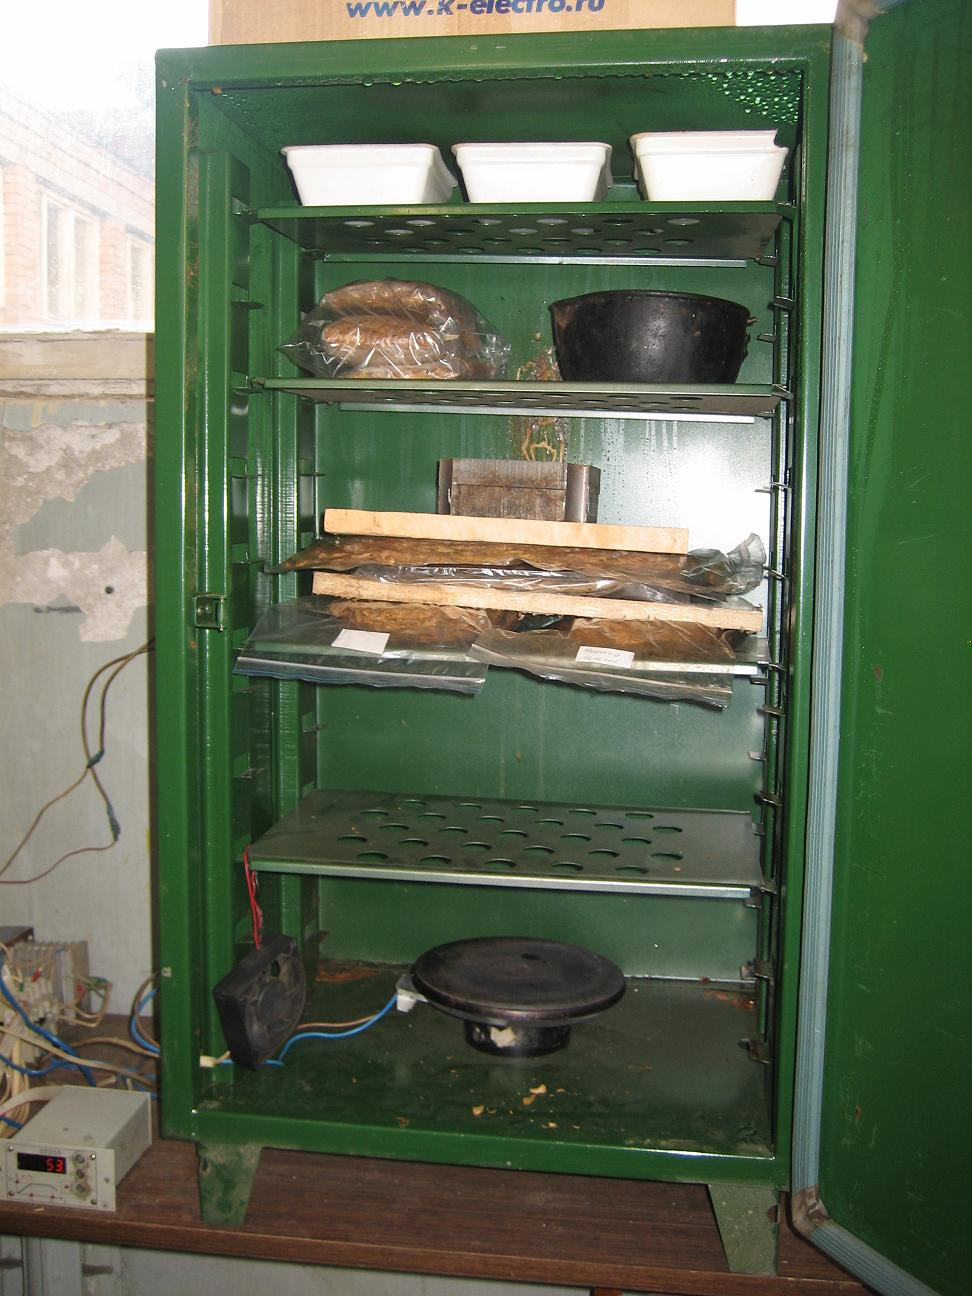 Шкаф для ферментации табака